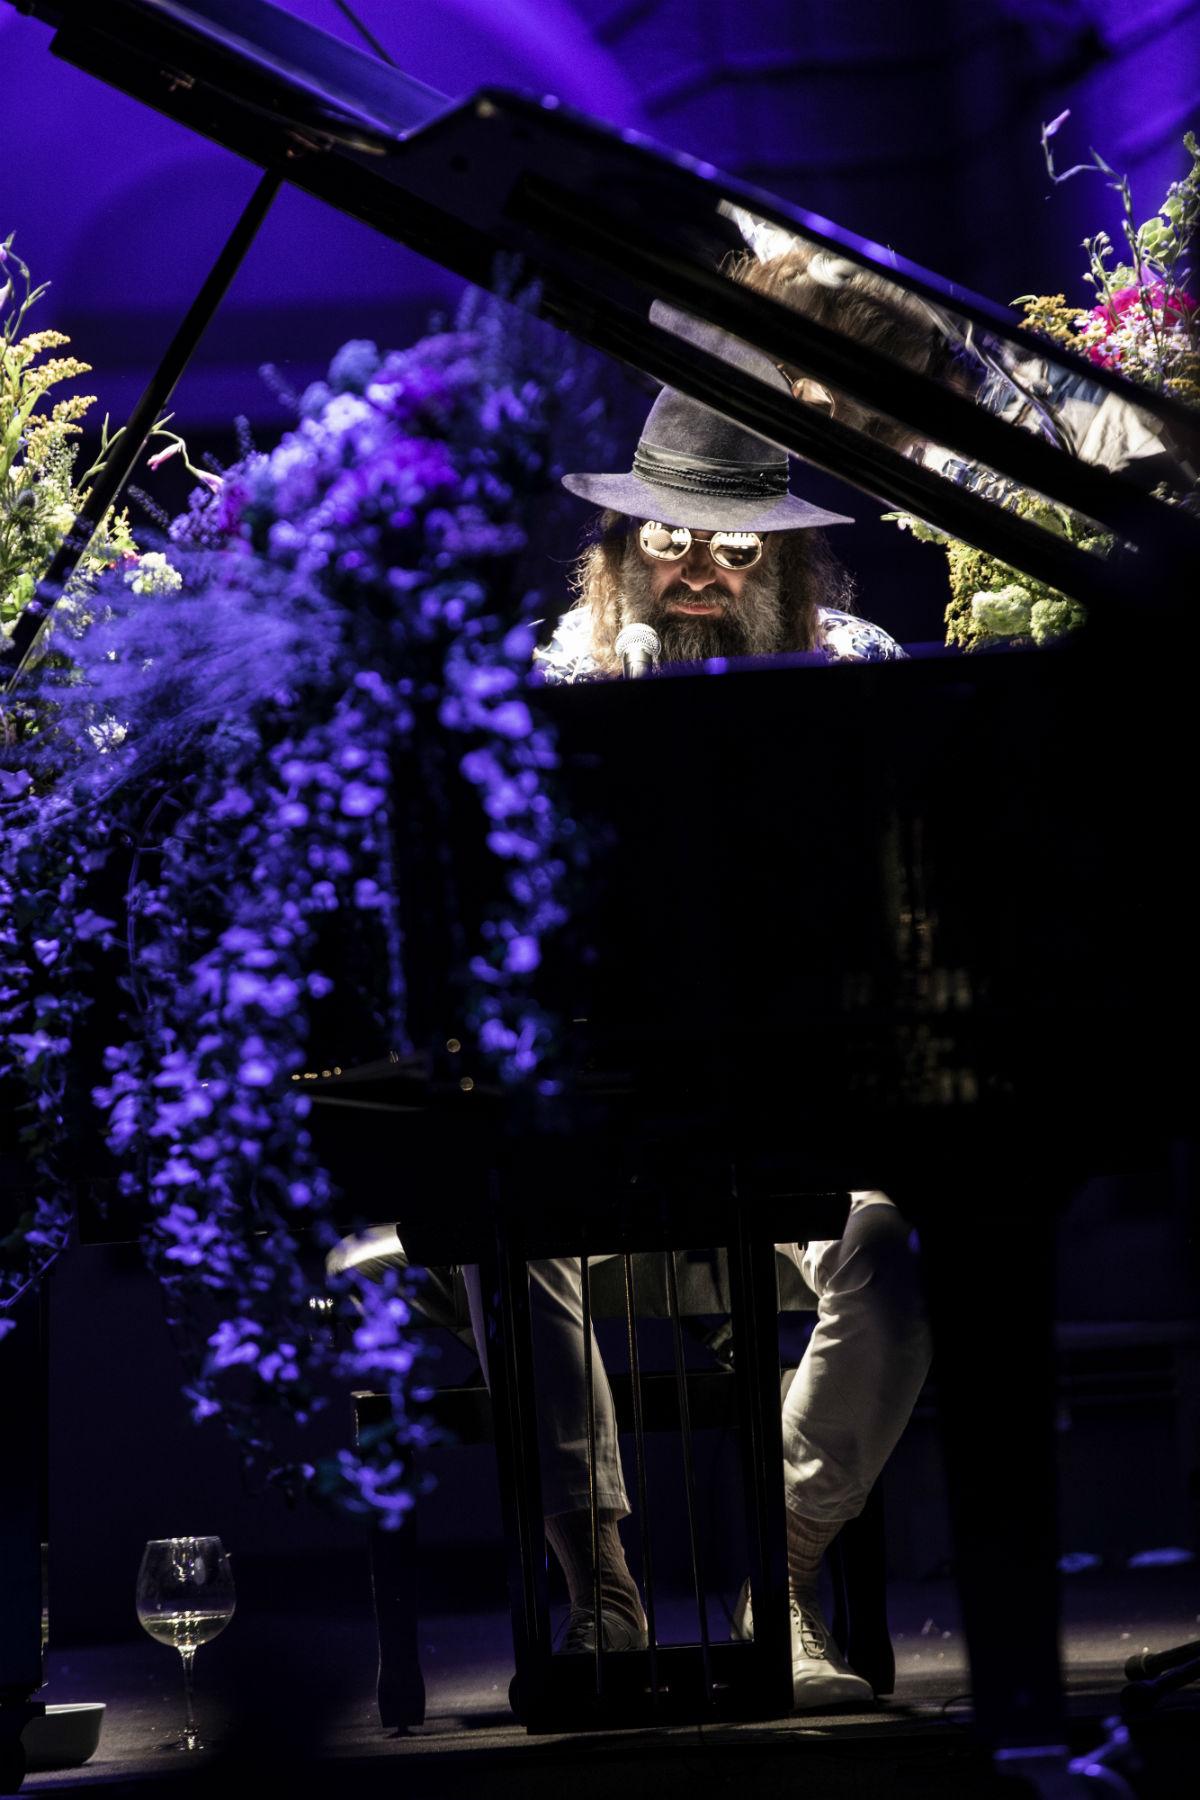 Sébastien Tellier @ Piano City 2018